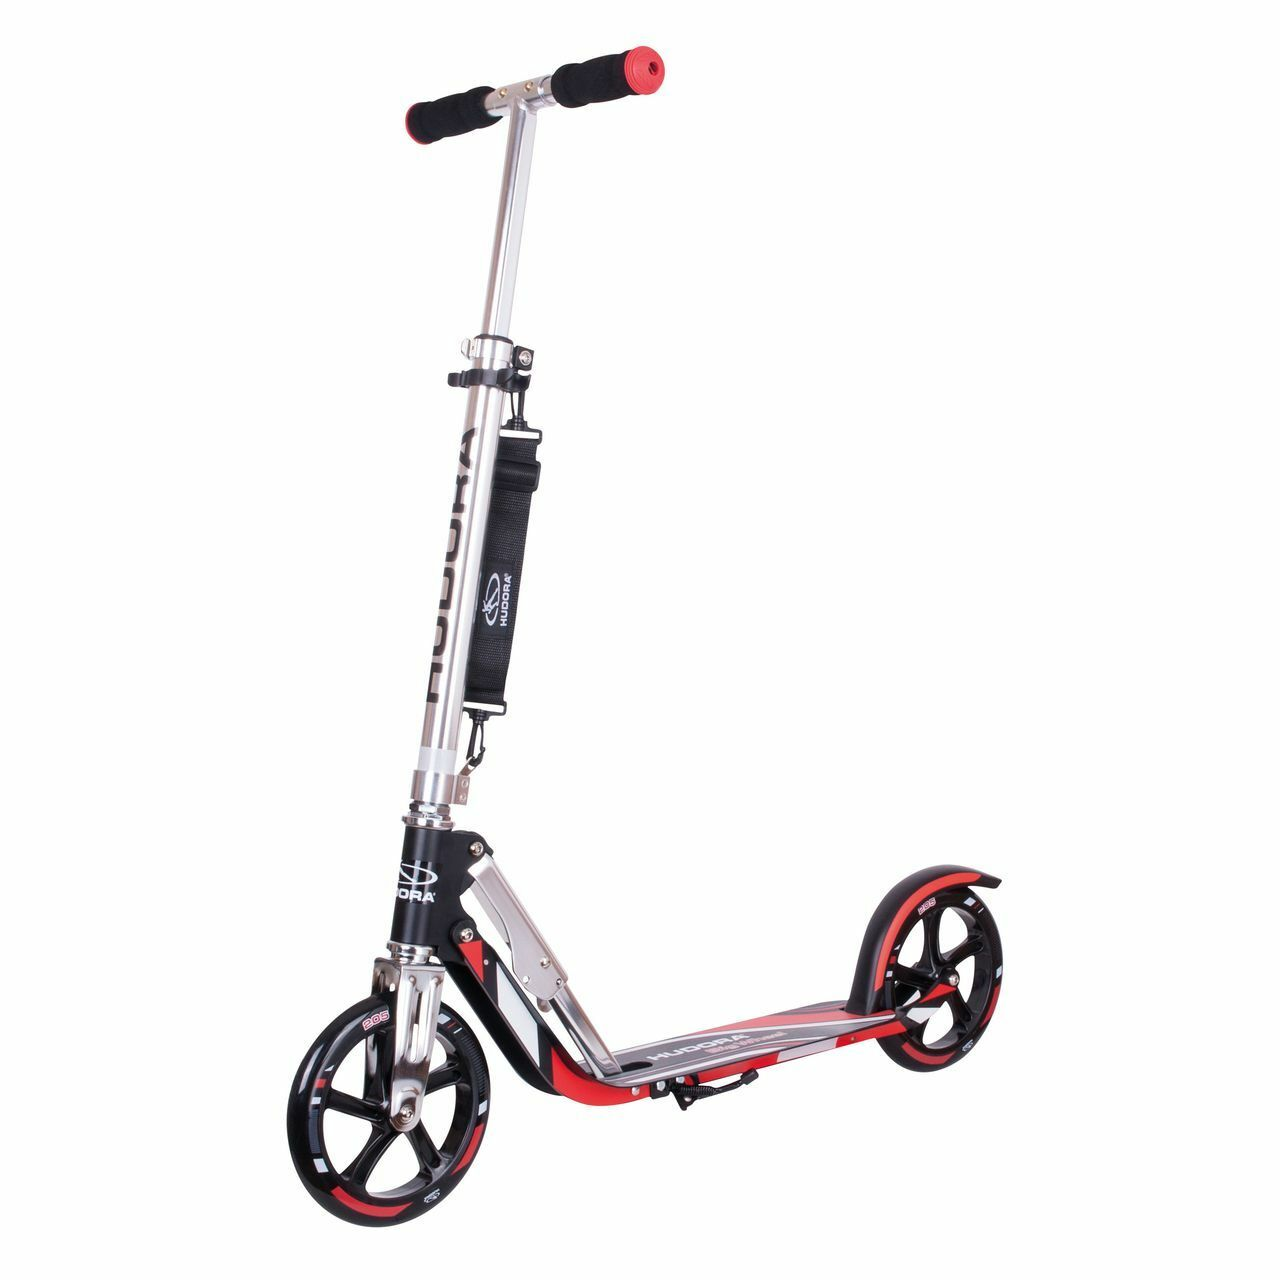 HUDORA Scooter Roller Big Wheel RX 205 Racing schwarz-rot